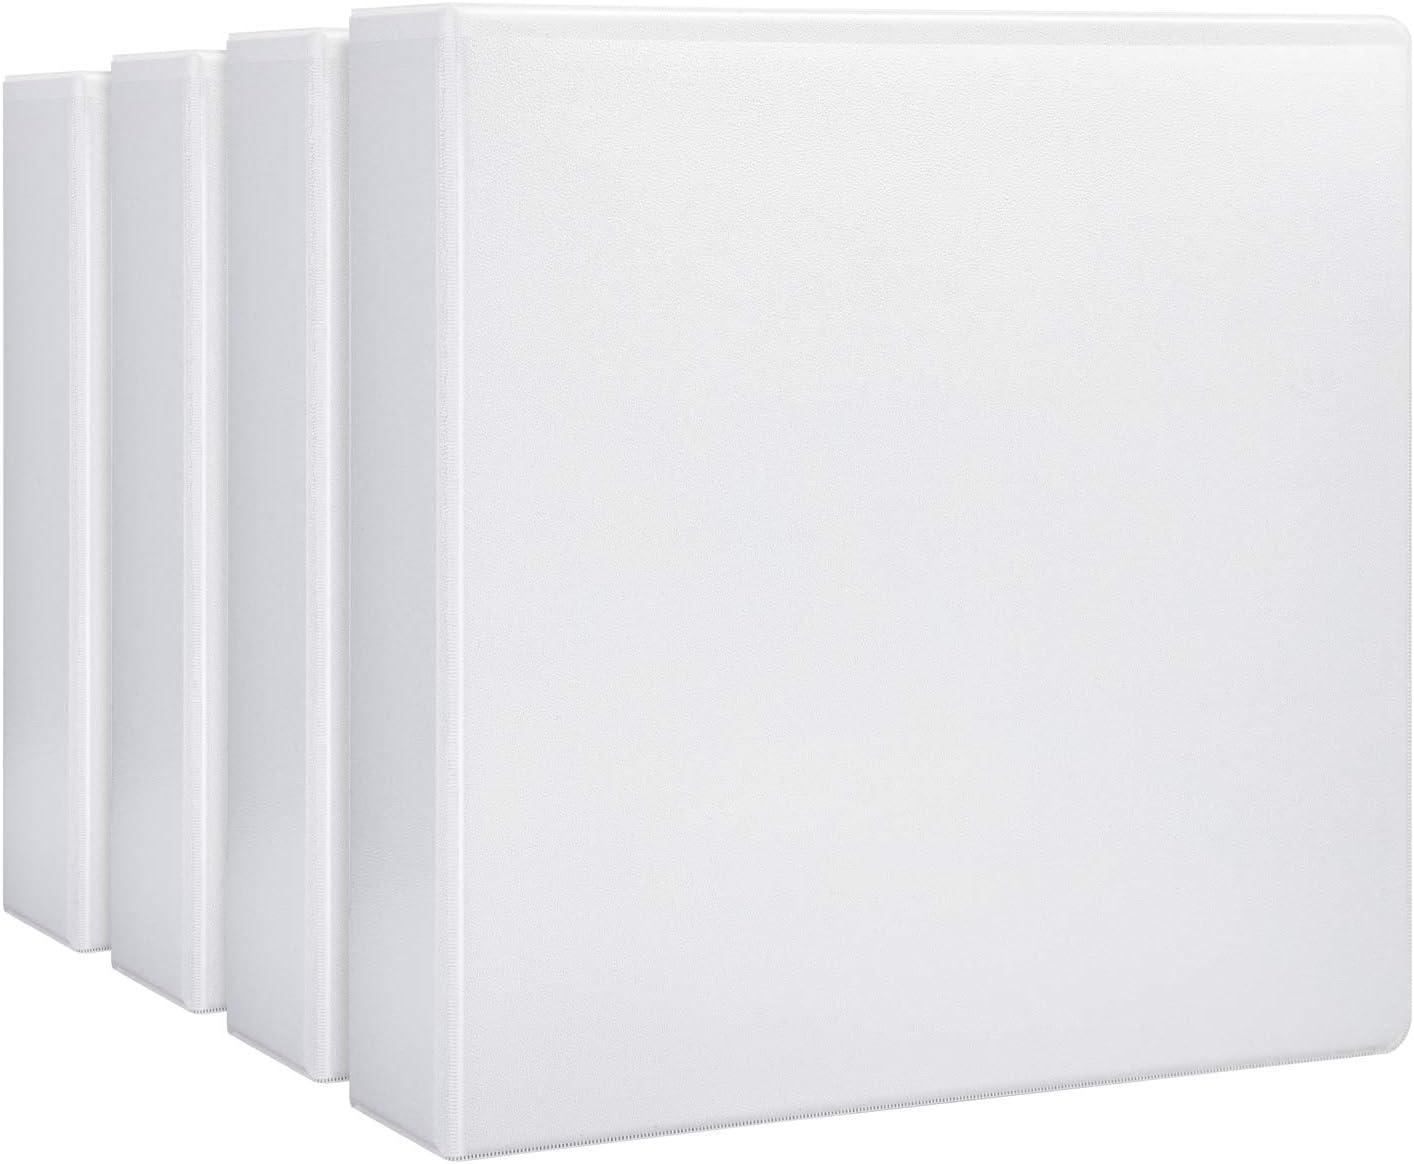 "AmazonBasics 2"" Heavy-Duty View 3 Ring Binder, White, 4/Pack"